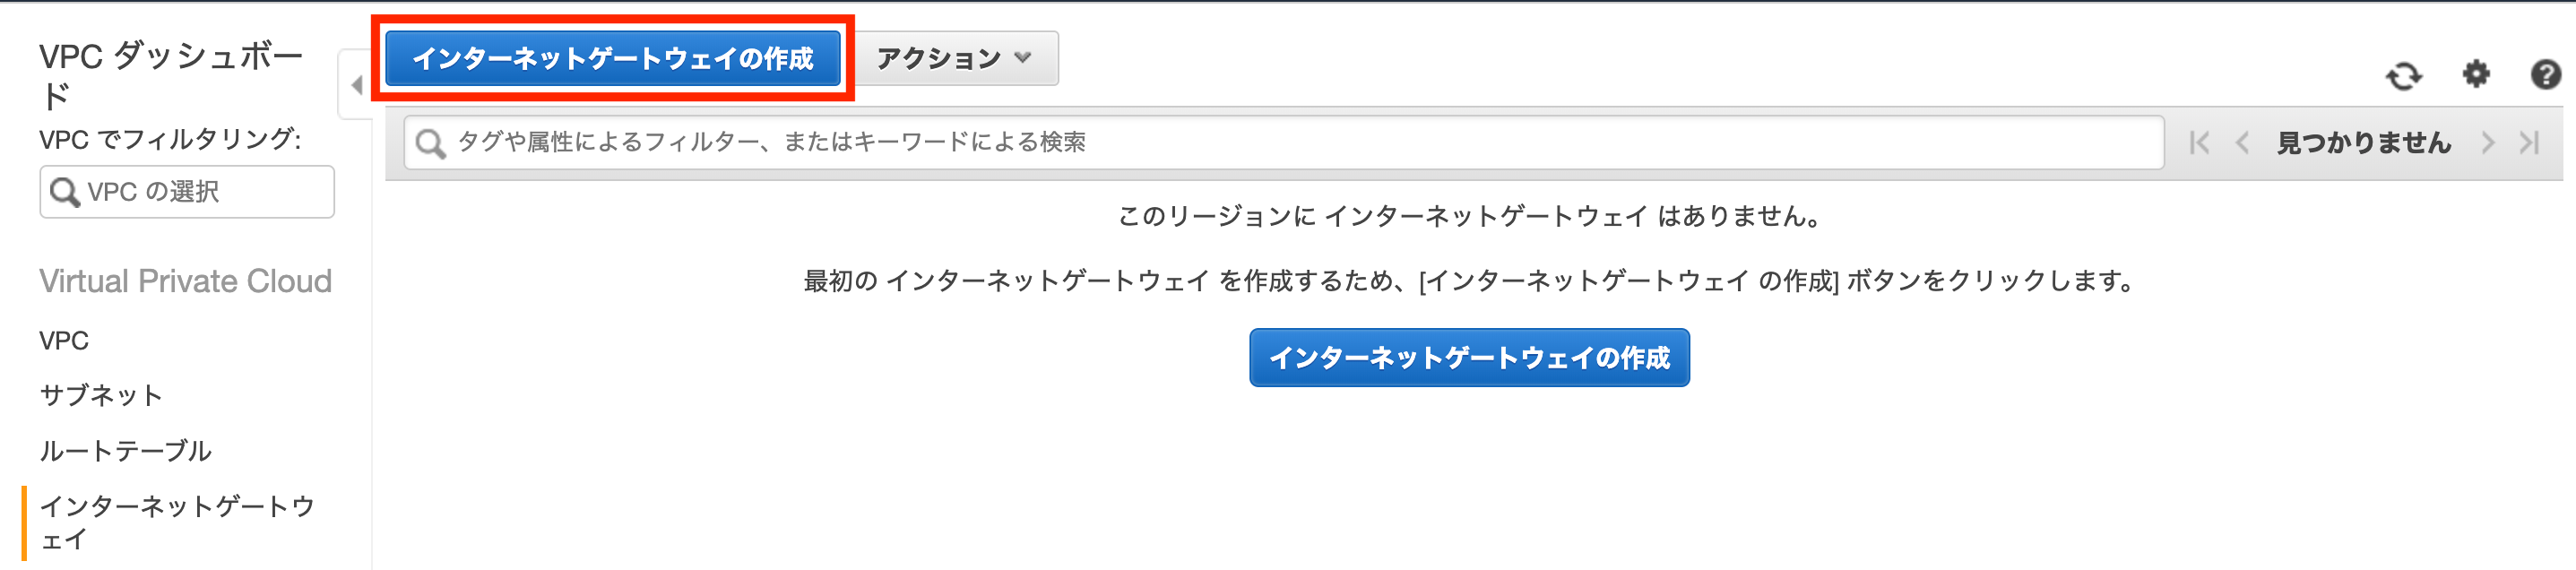 igw作成①.png